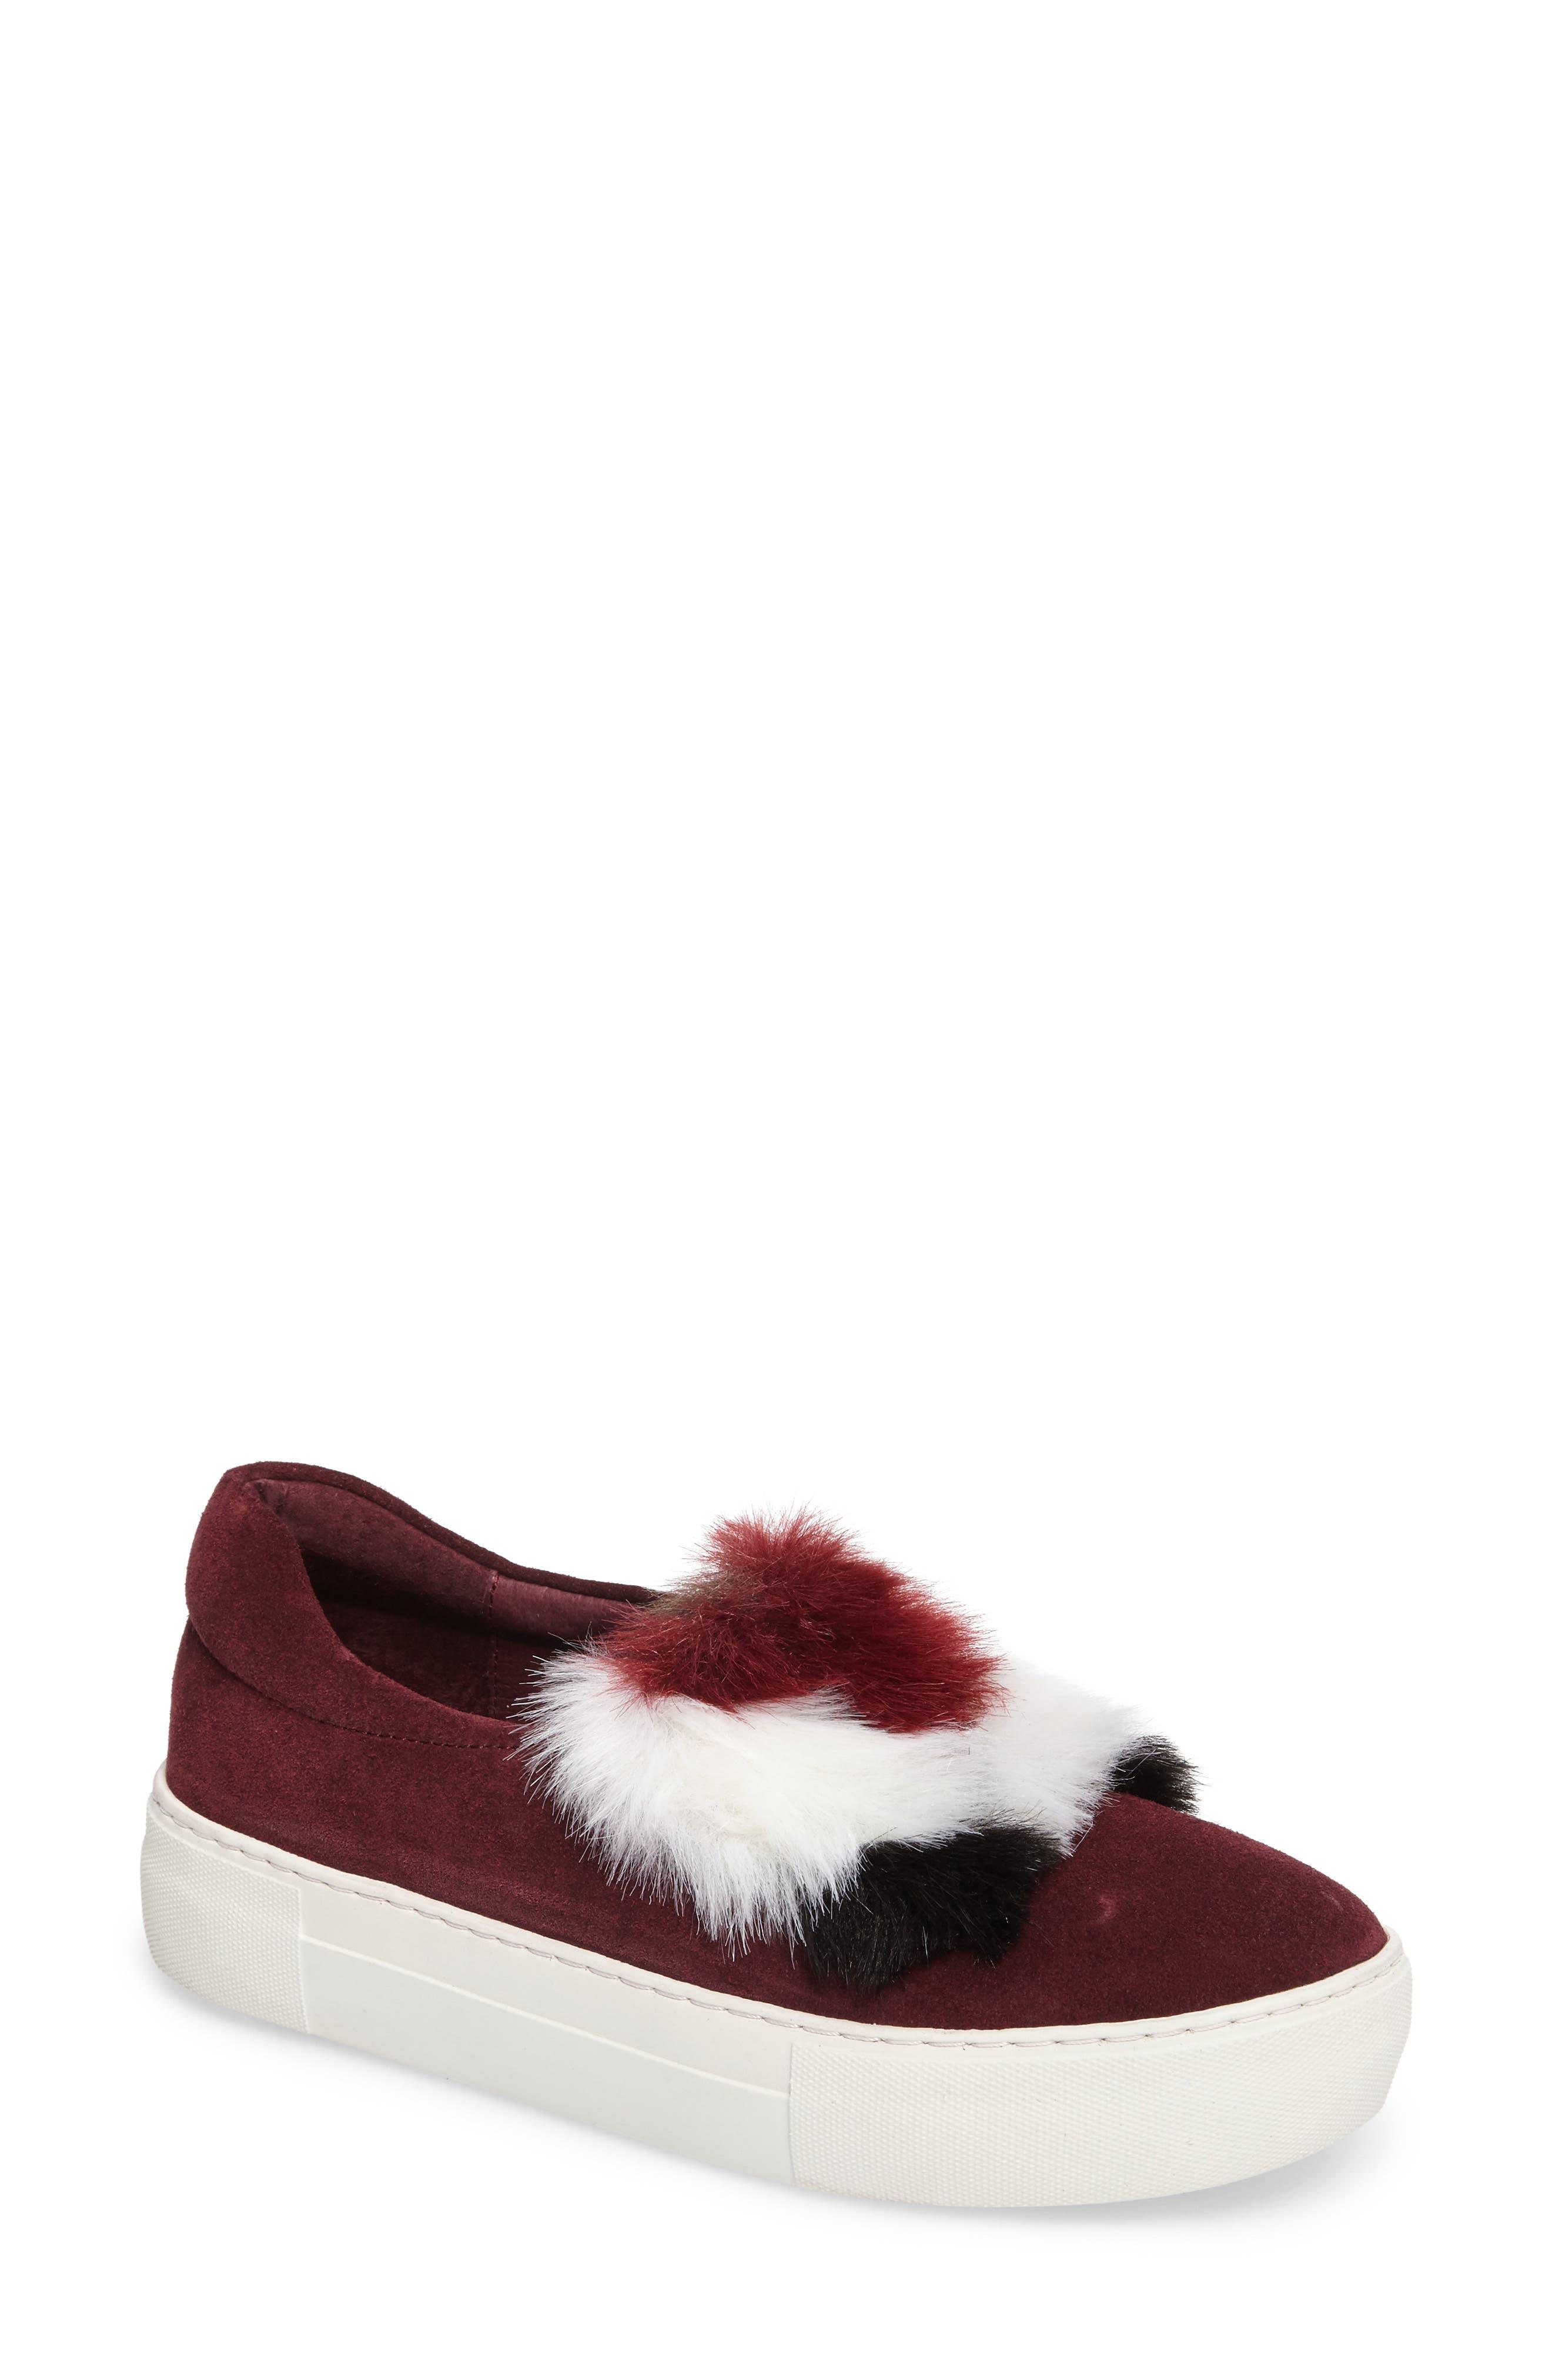 Alexi Faux Fur Slip-On Sneaker,                         Main,                         color, Burgundy Suede